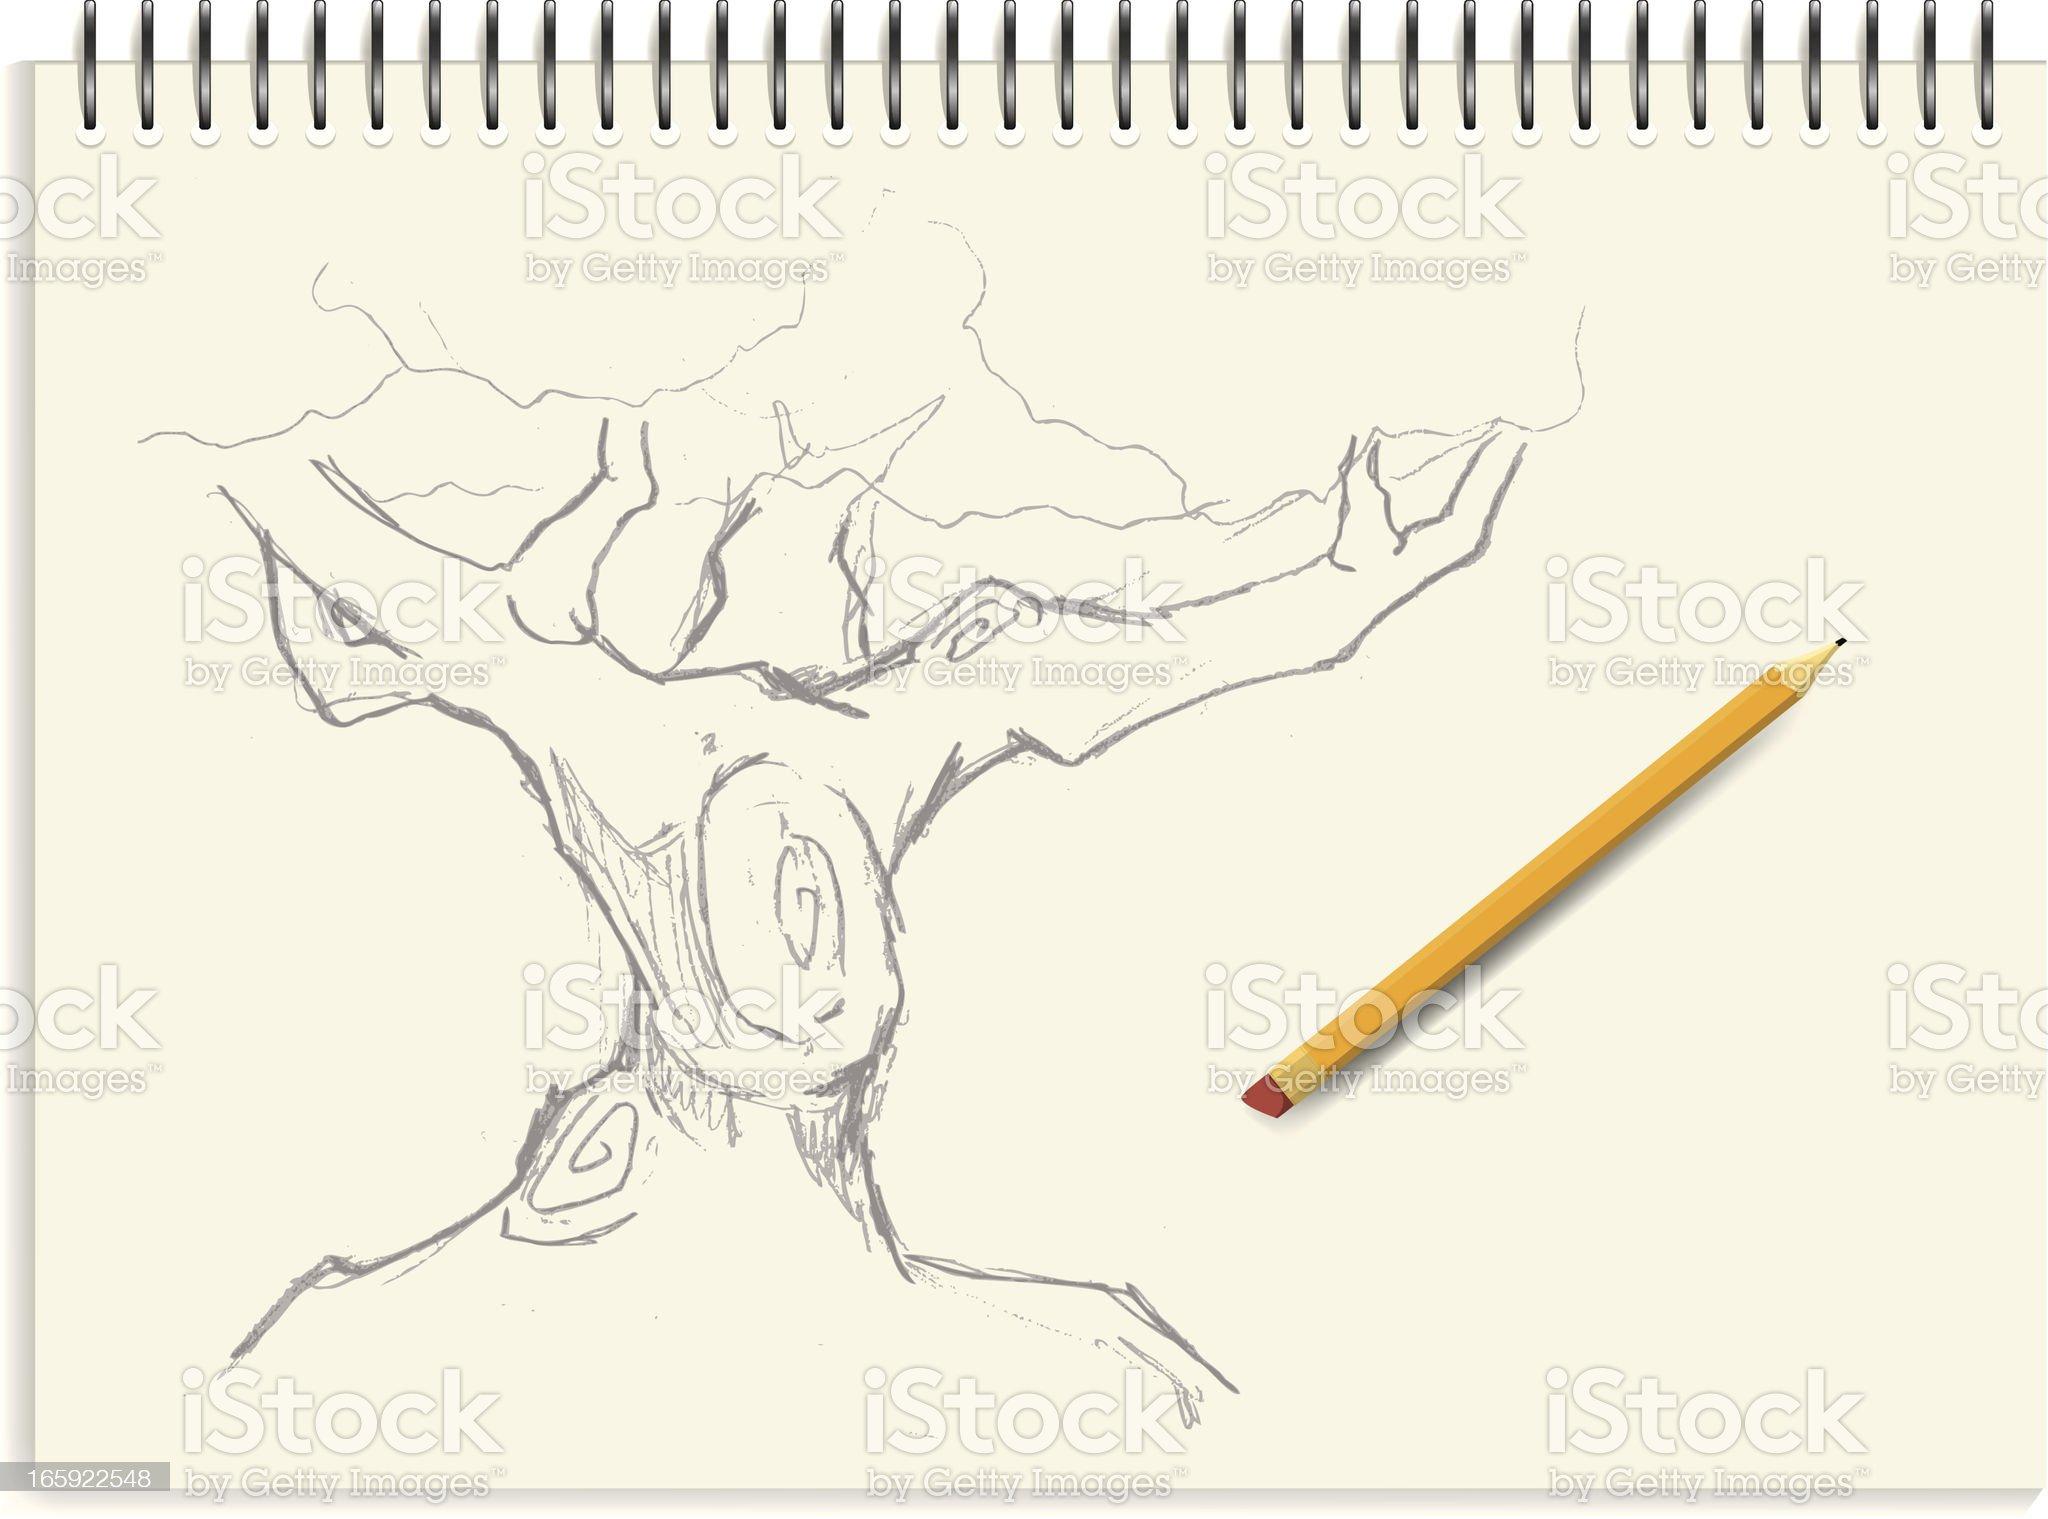 Sketch - Tree royalty-free stock vector art